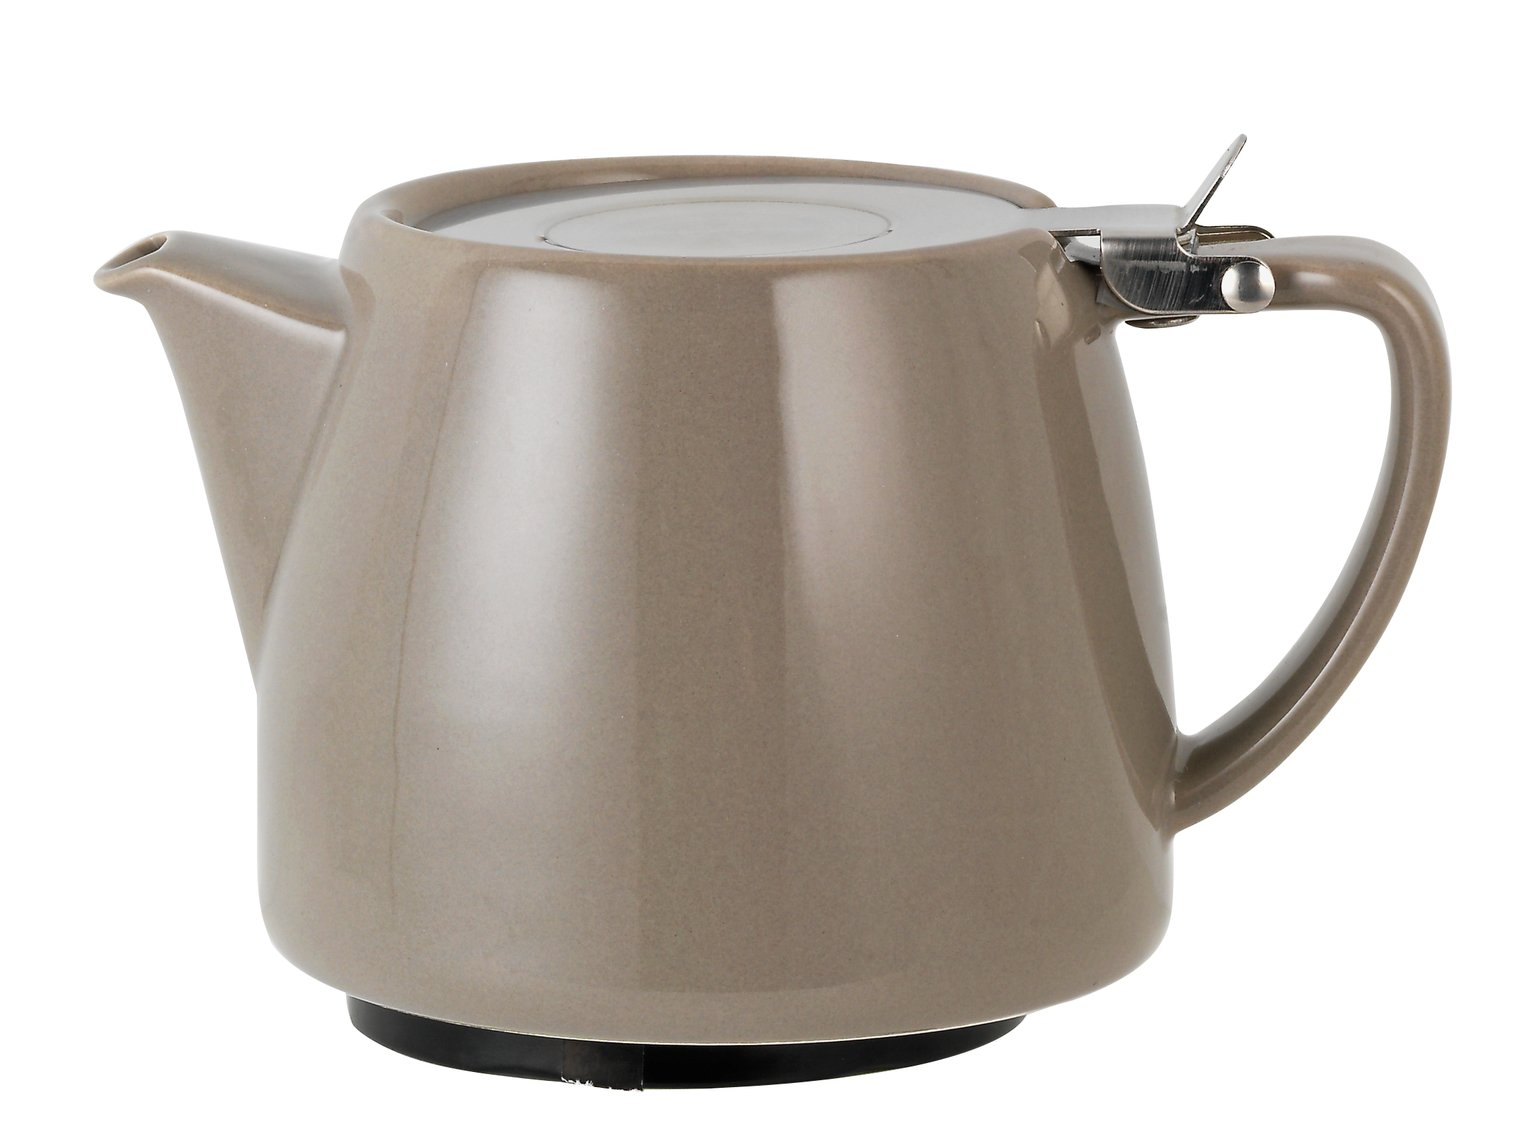 argos home ceramic tea pot reviews. Black Bedroom Furniture Sets. Home Design Ideas